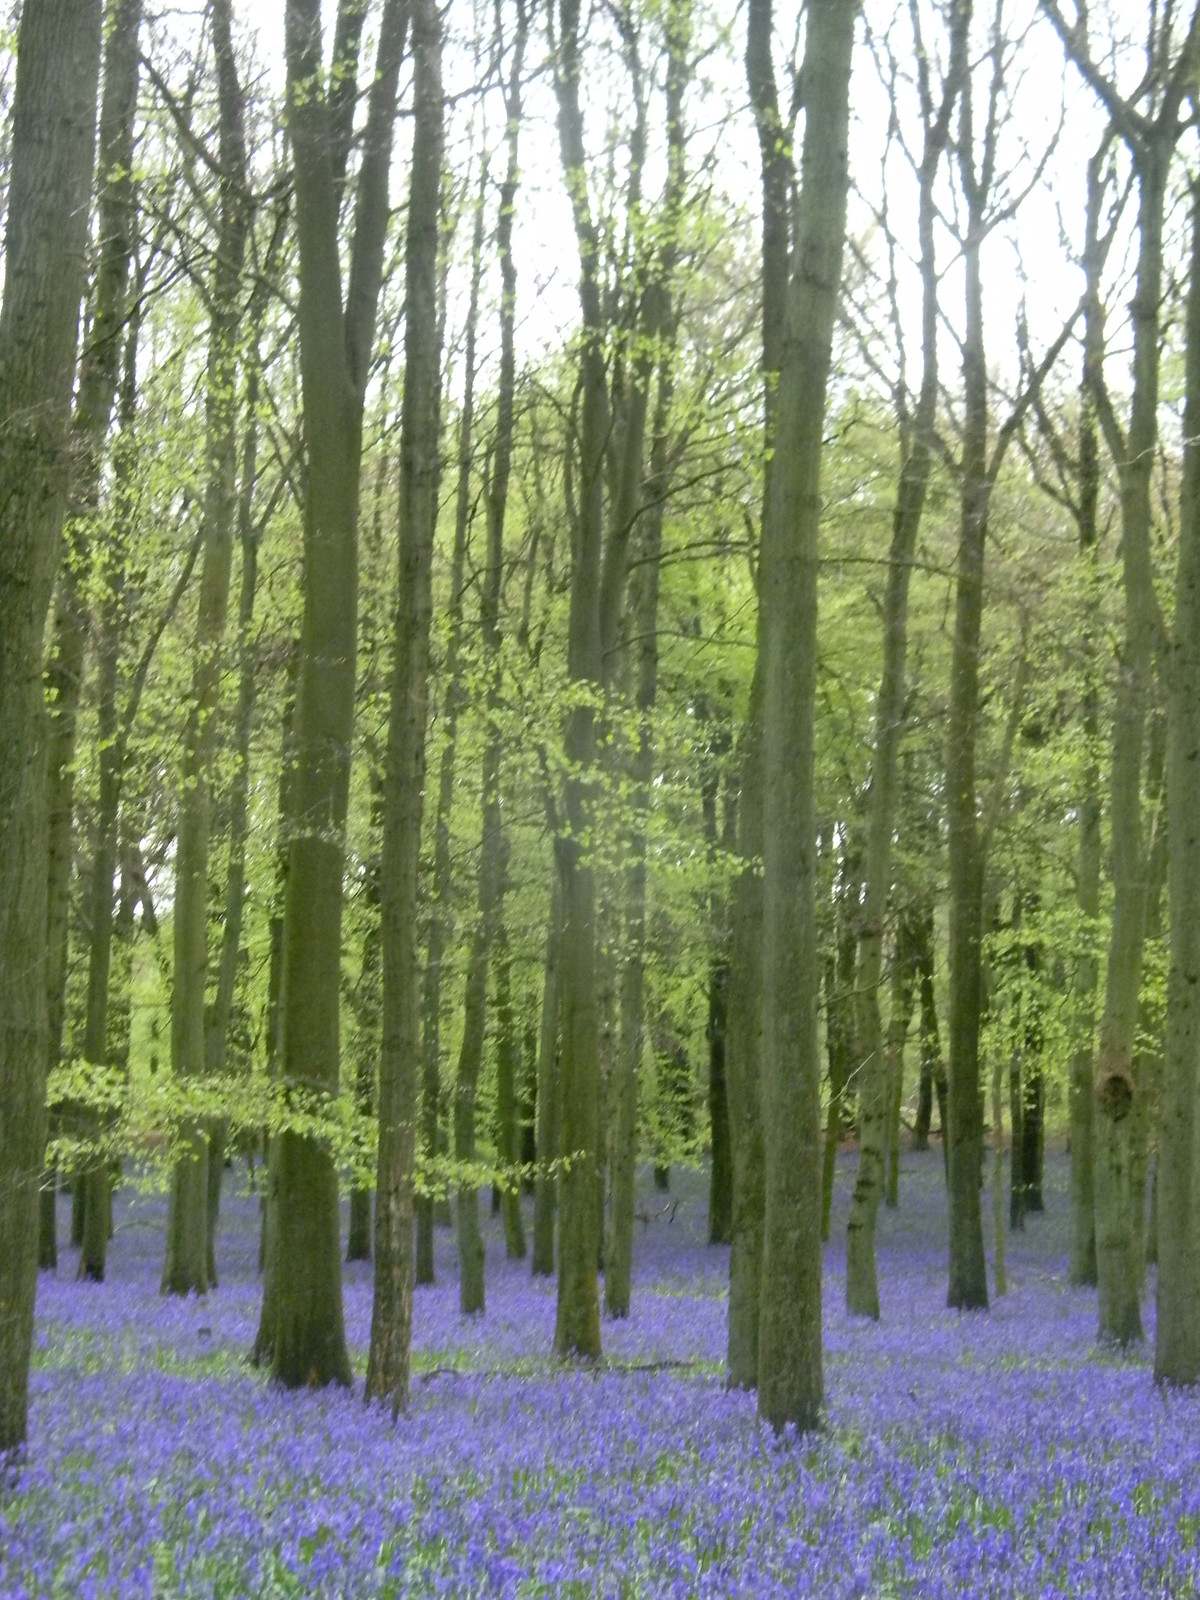 Dockey Wood bluebells Tring to Berkhamsted Dockey Wood